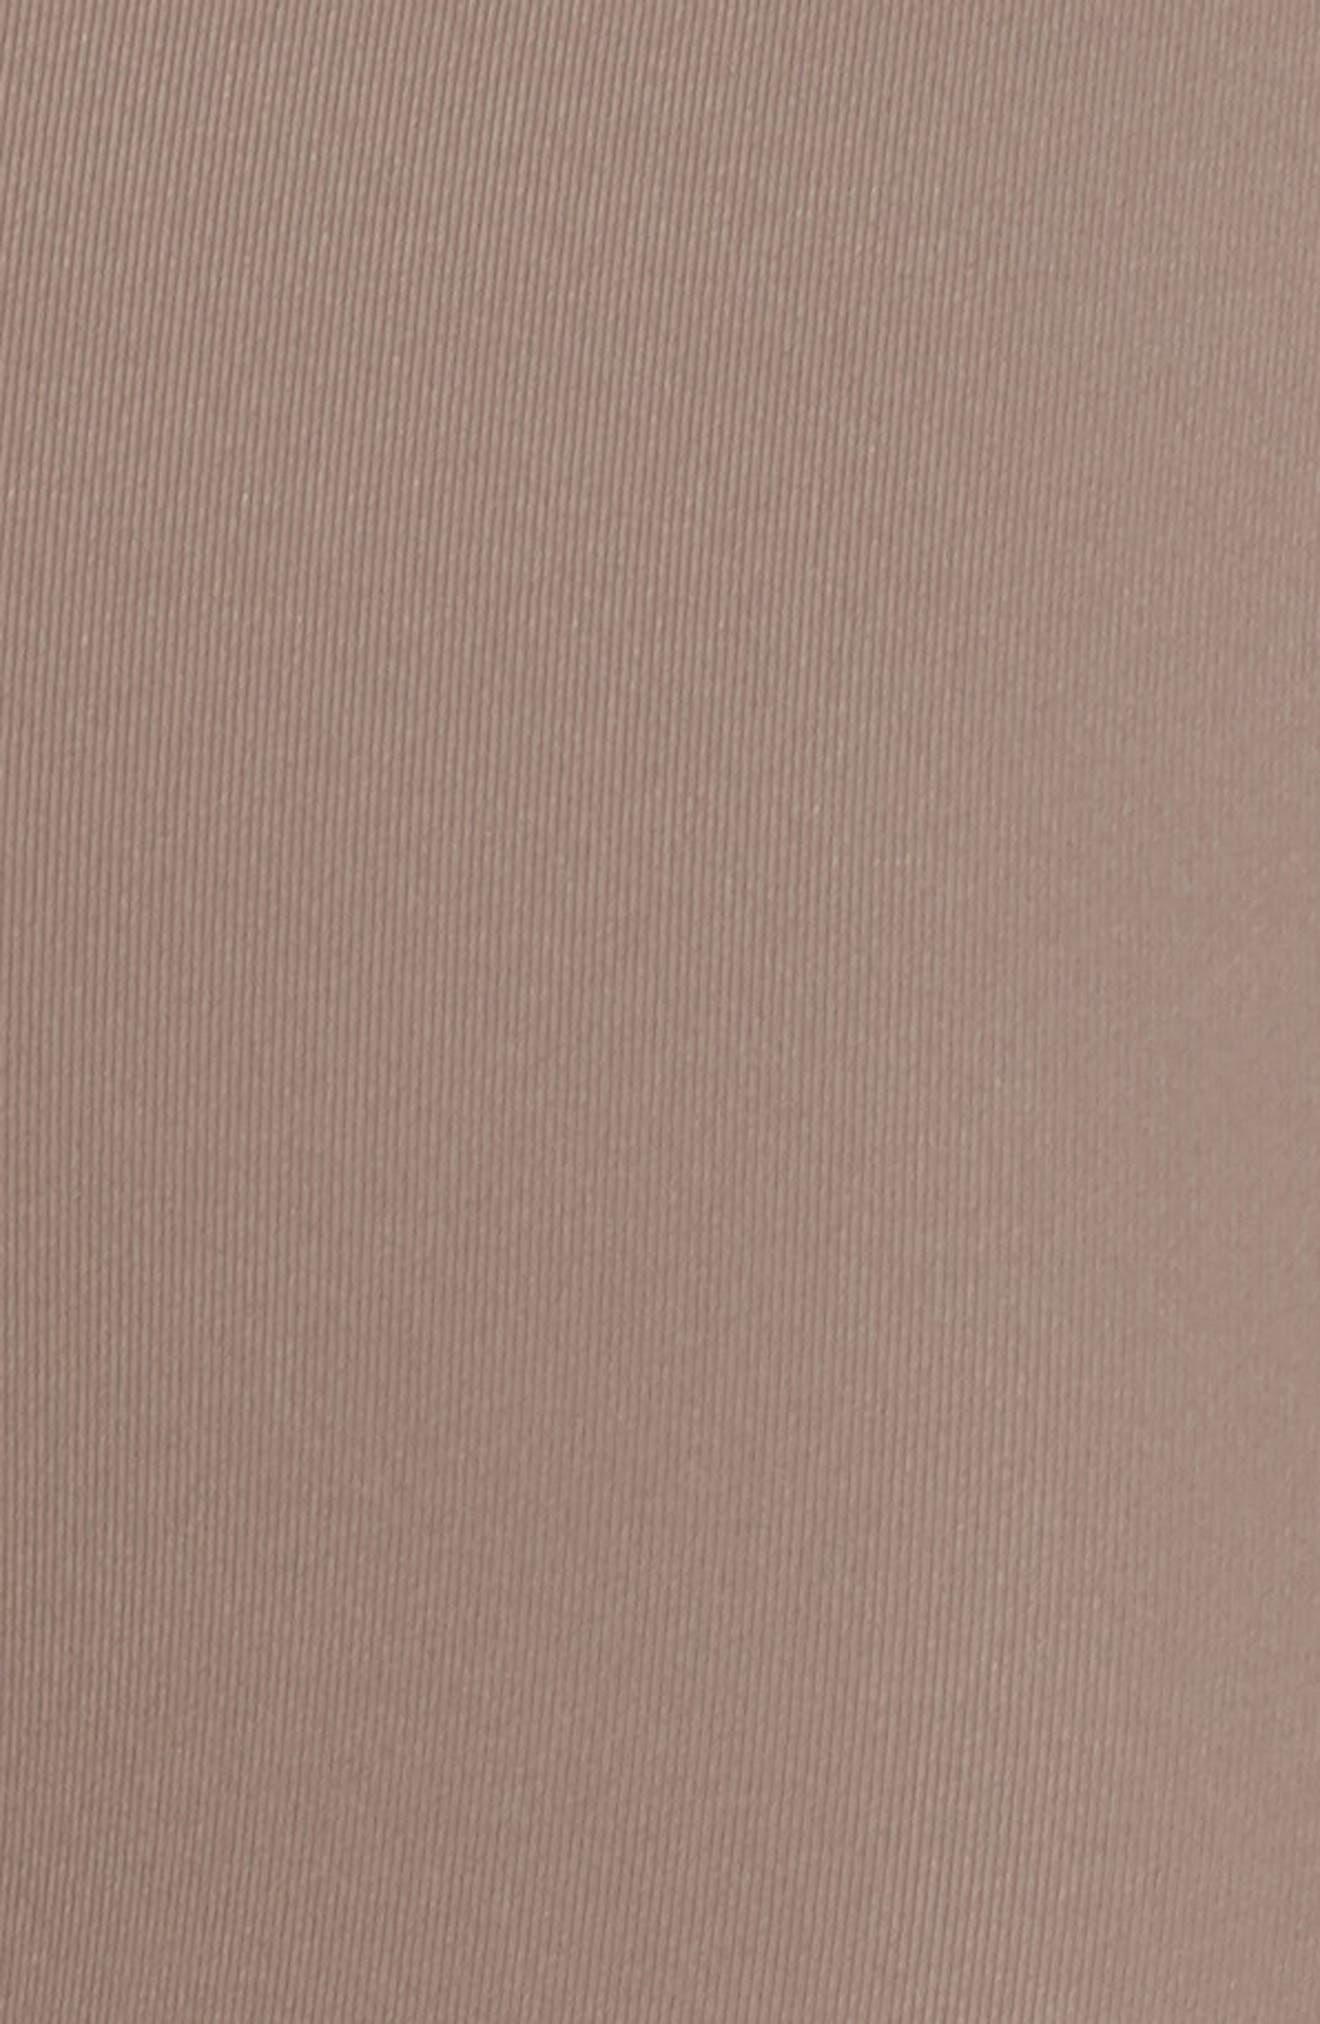 Senso Vision High Waist Crop Leggings,                             Alternate thumbnail 3, color,                             Tan Dusk